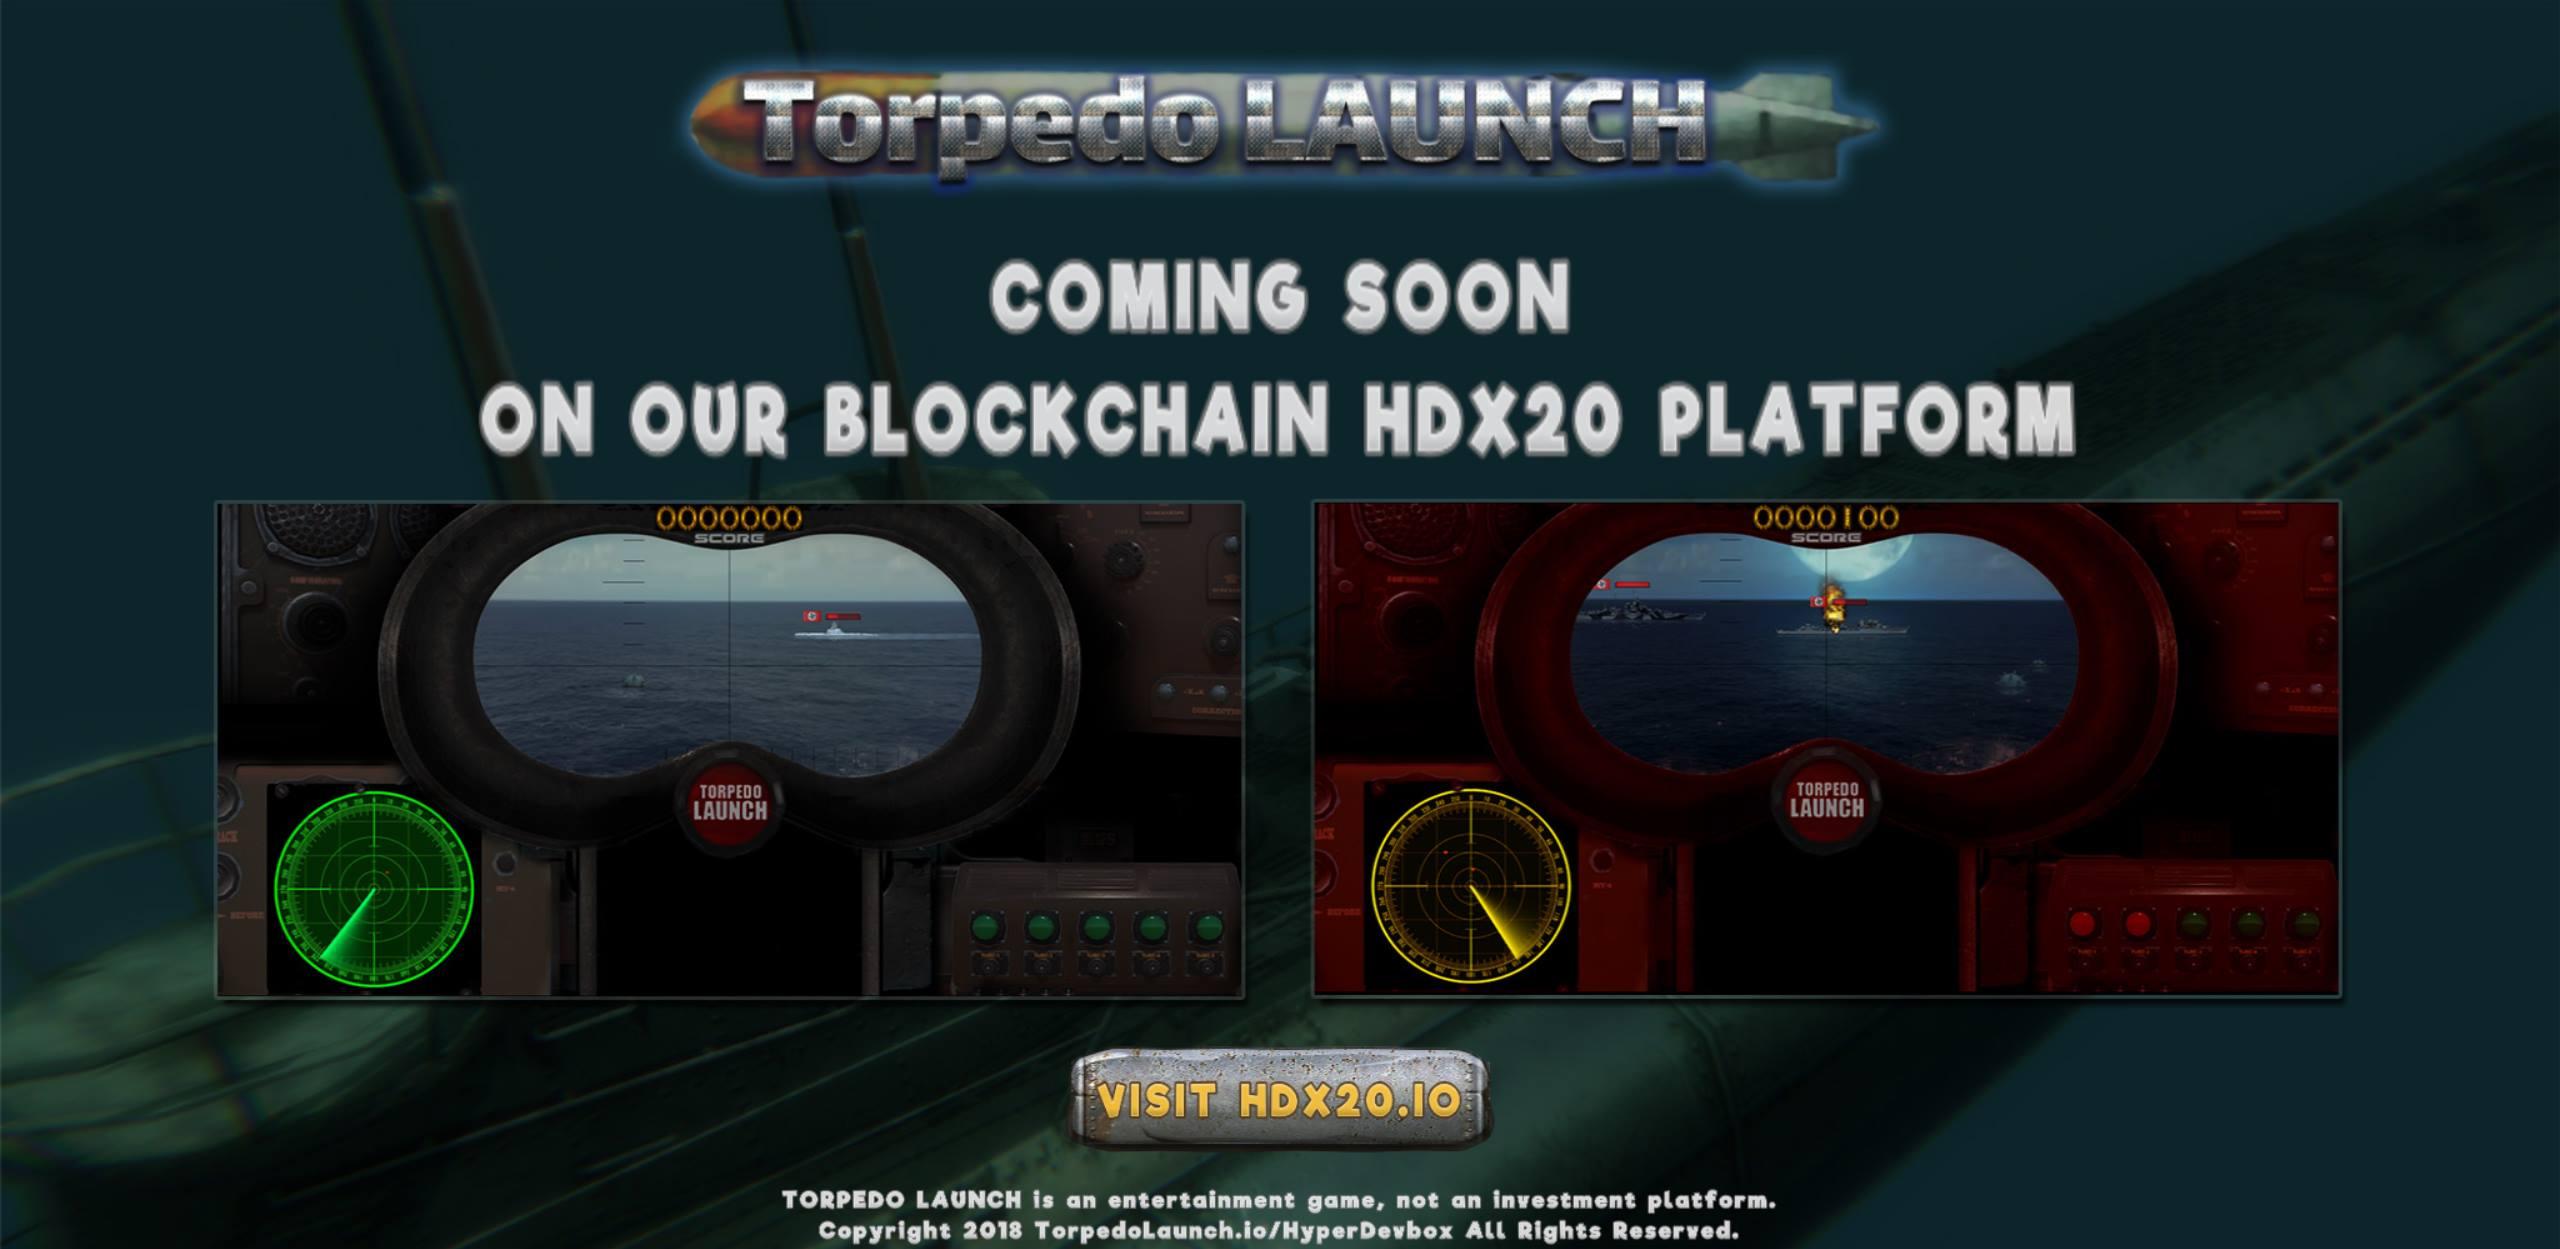 torpedolaunch.io